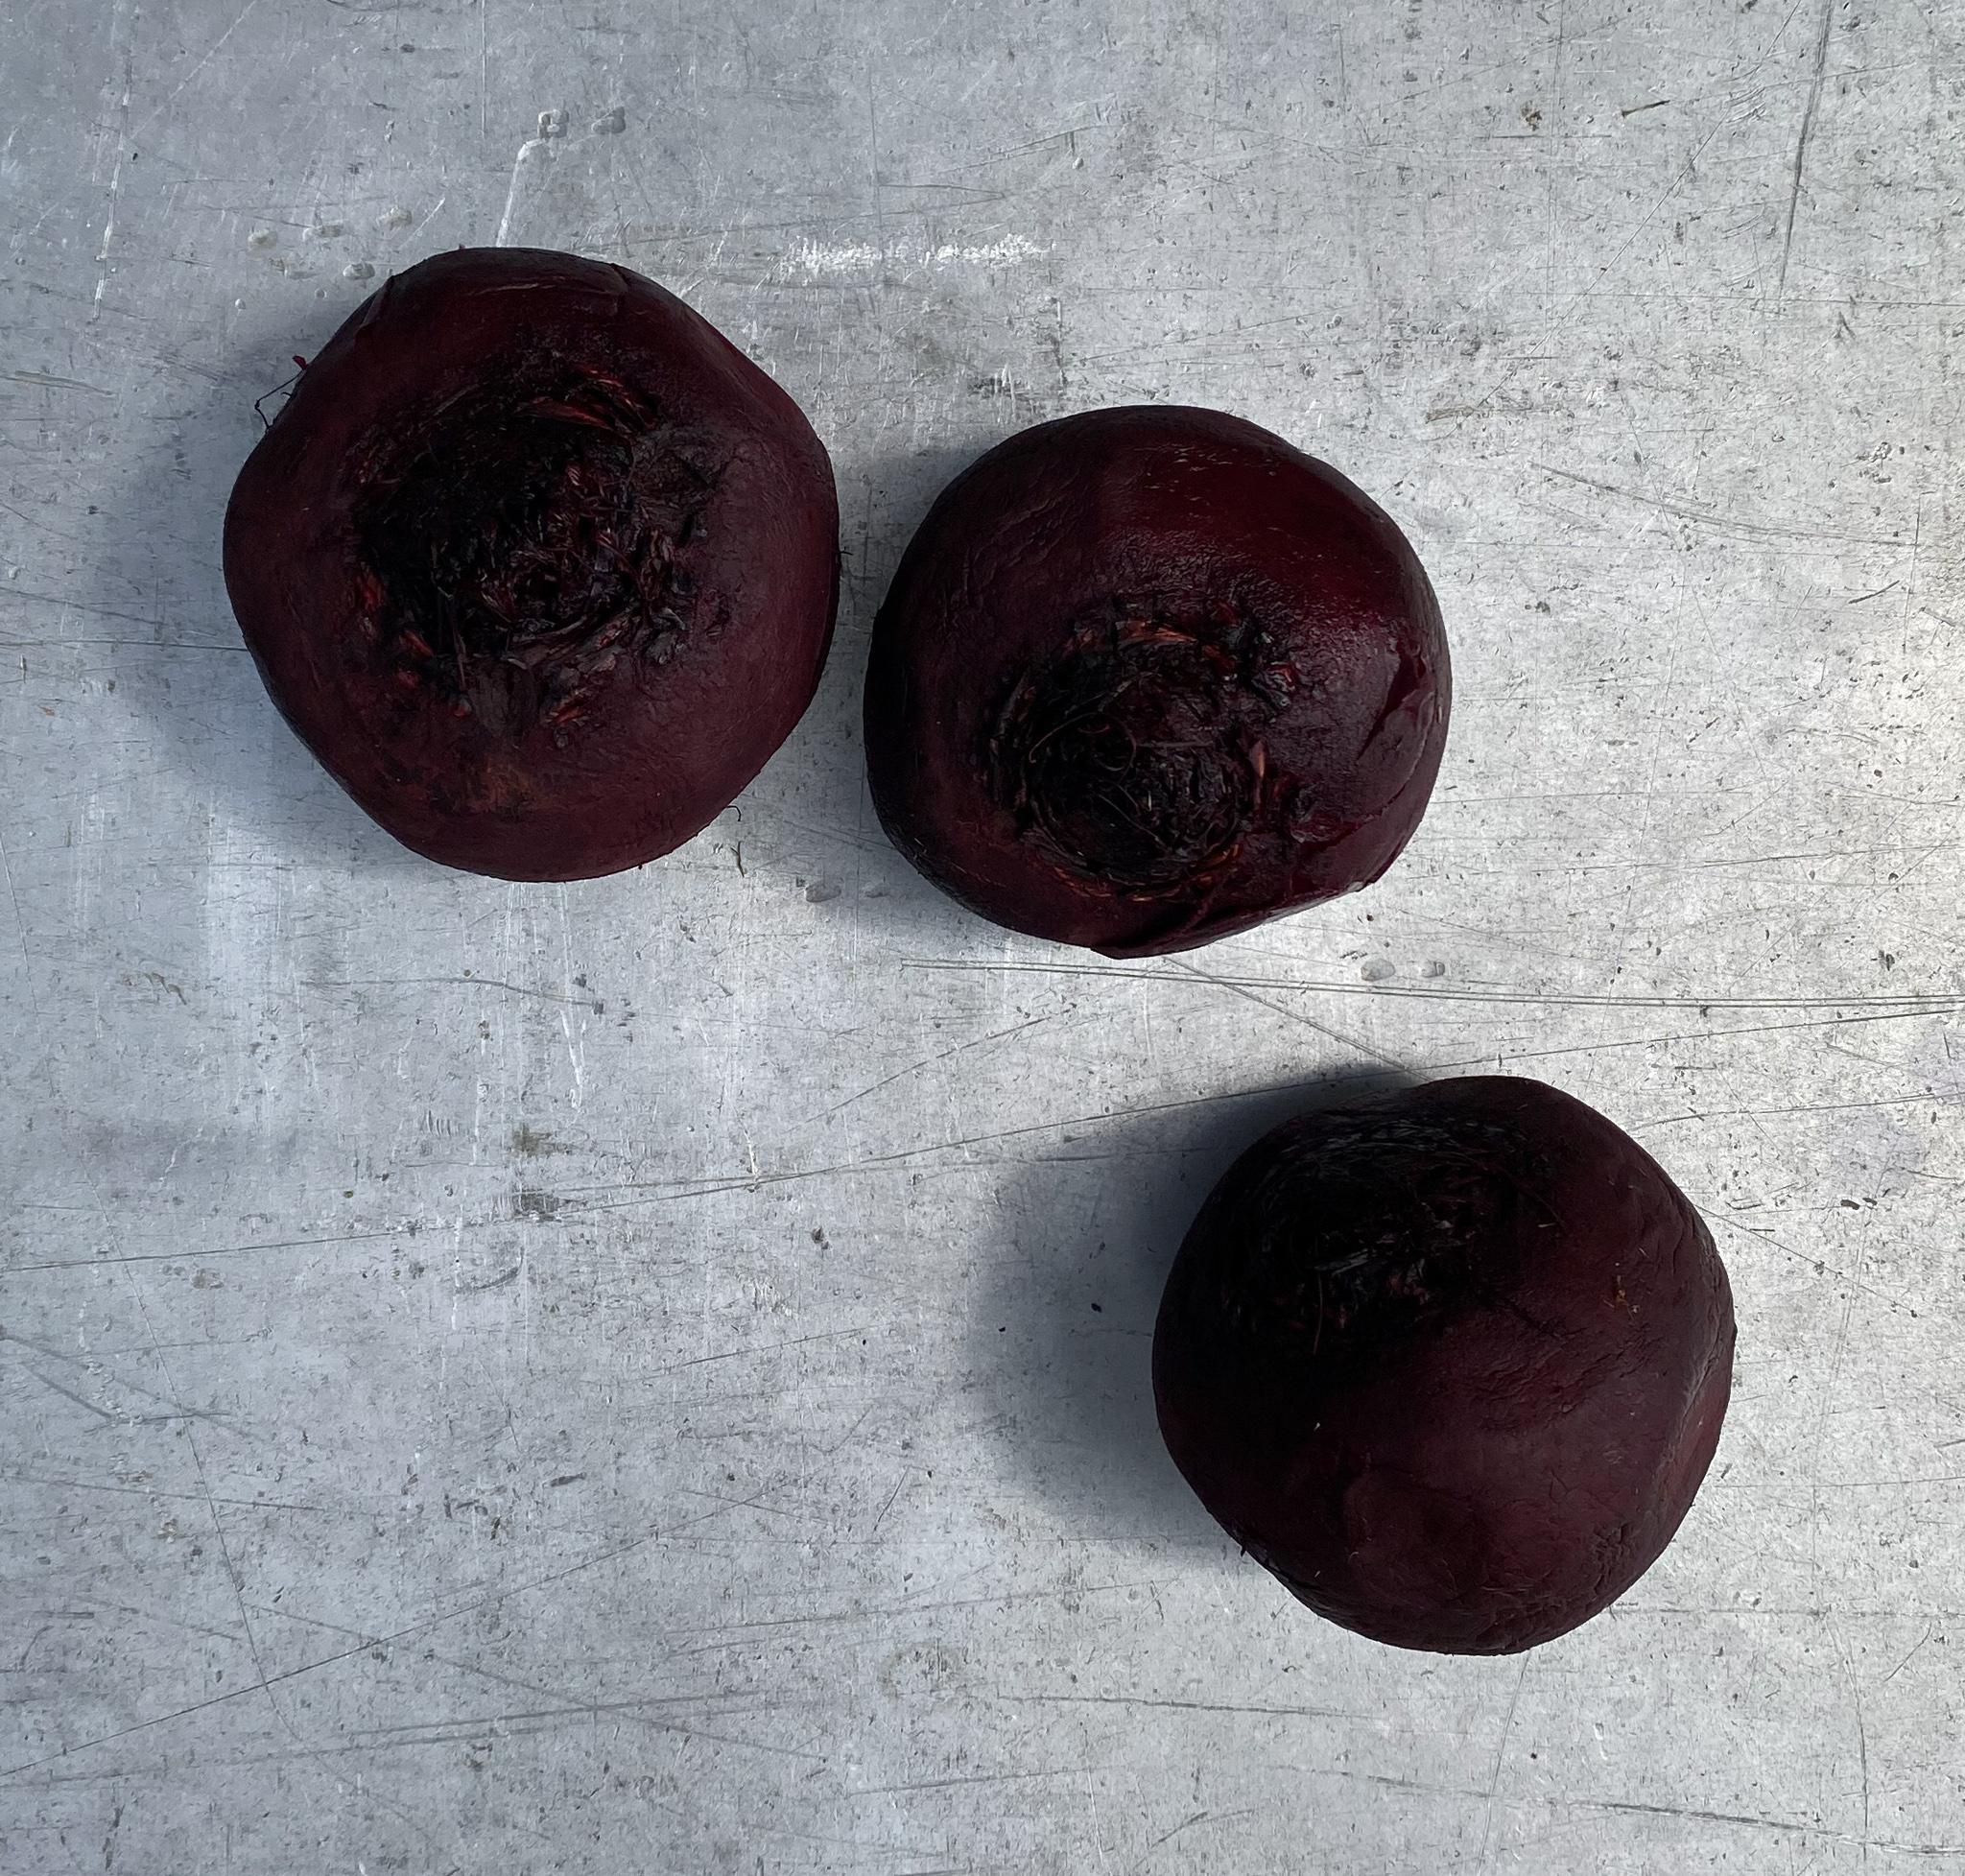 bettrave rouge cuite